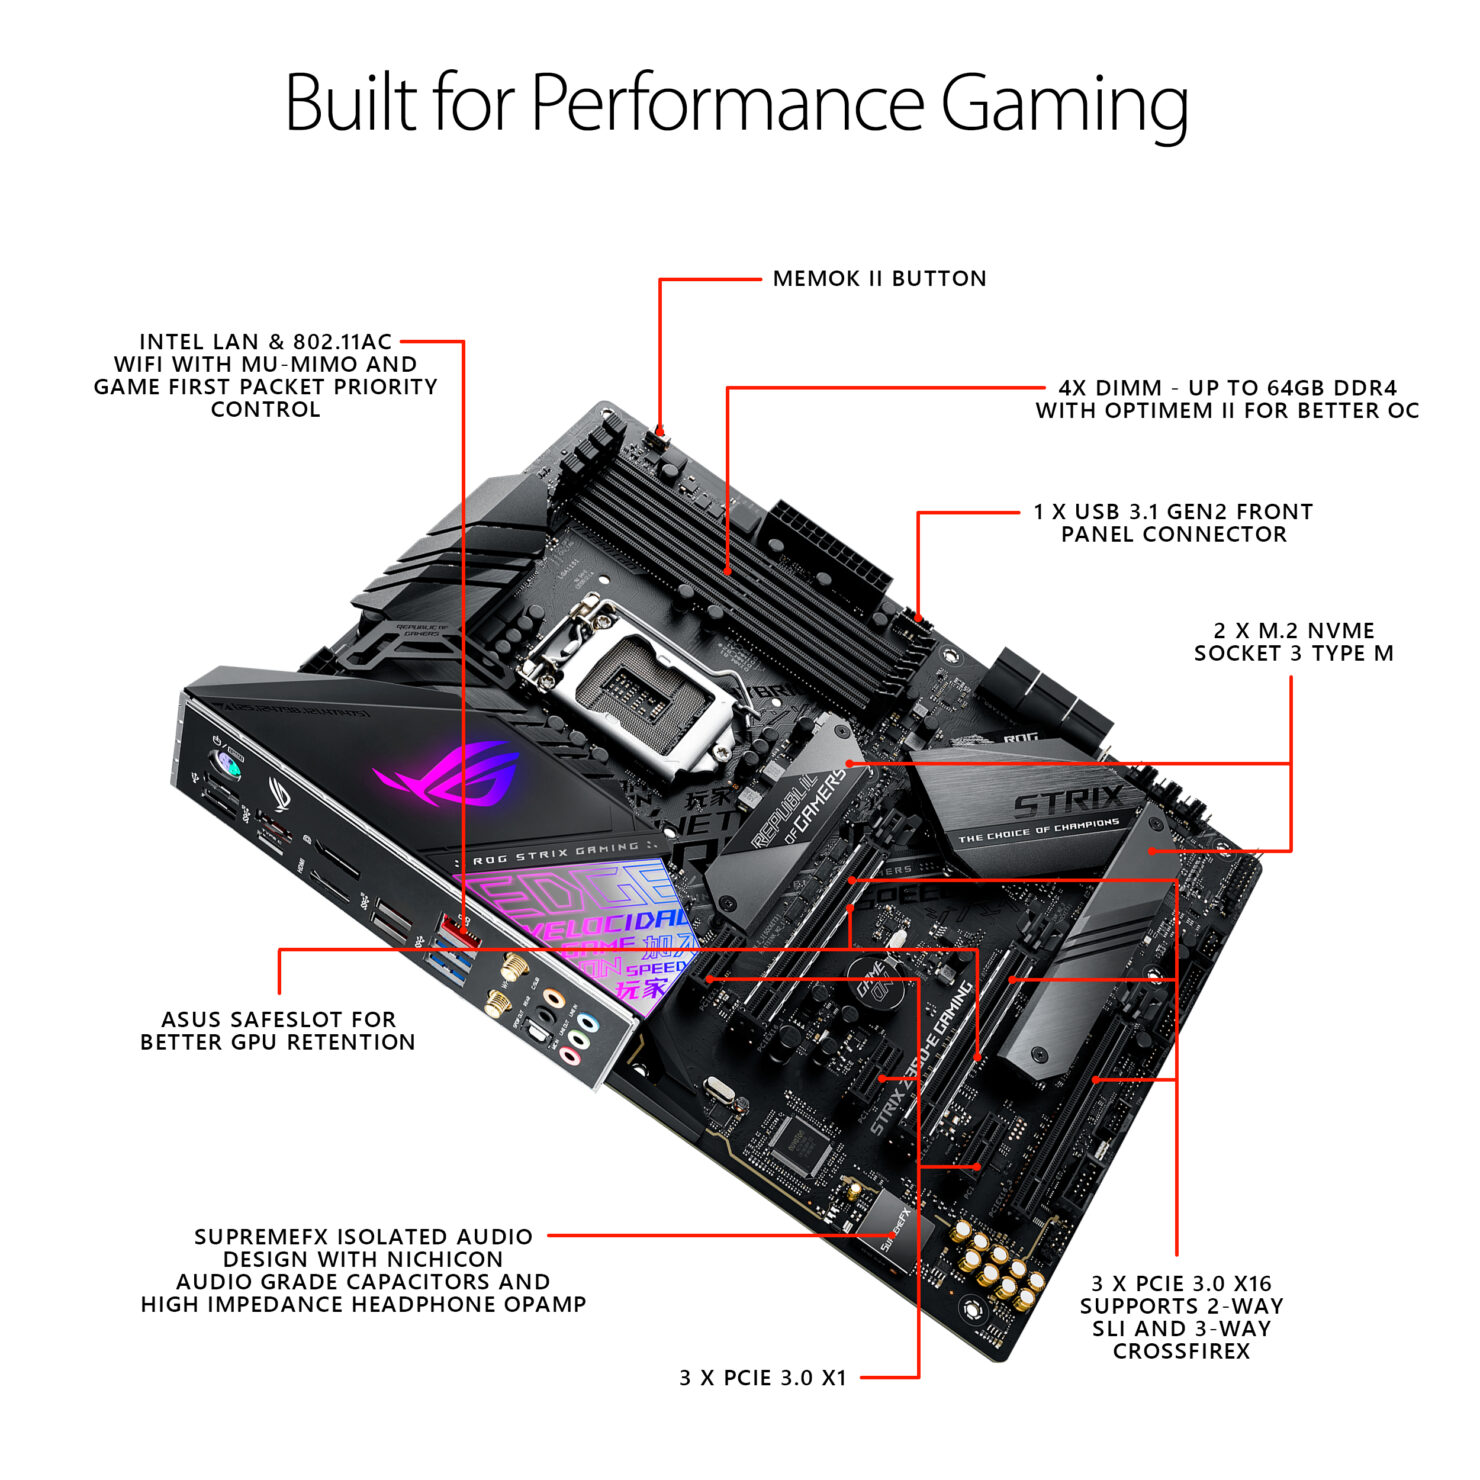 4-rog-strix-z390-e-gaming-built-for-performance-gaming